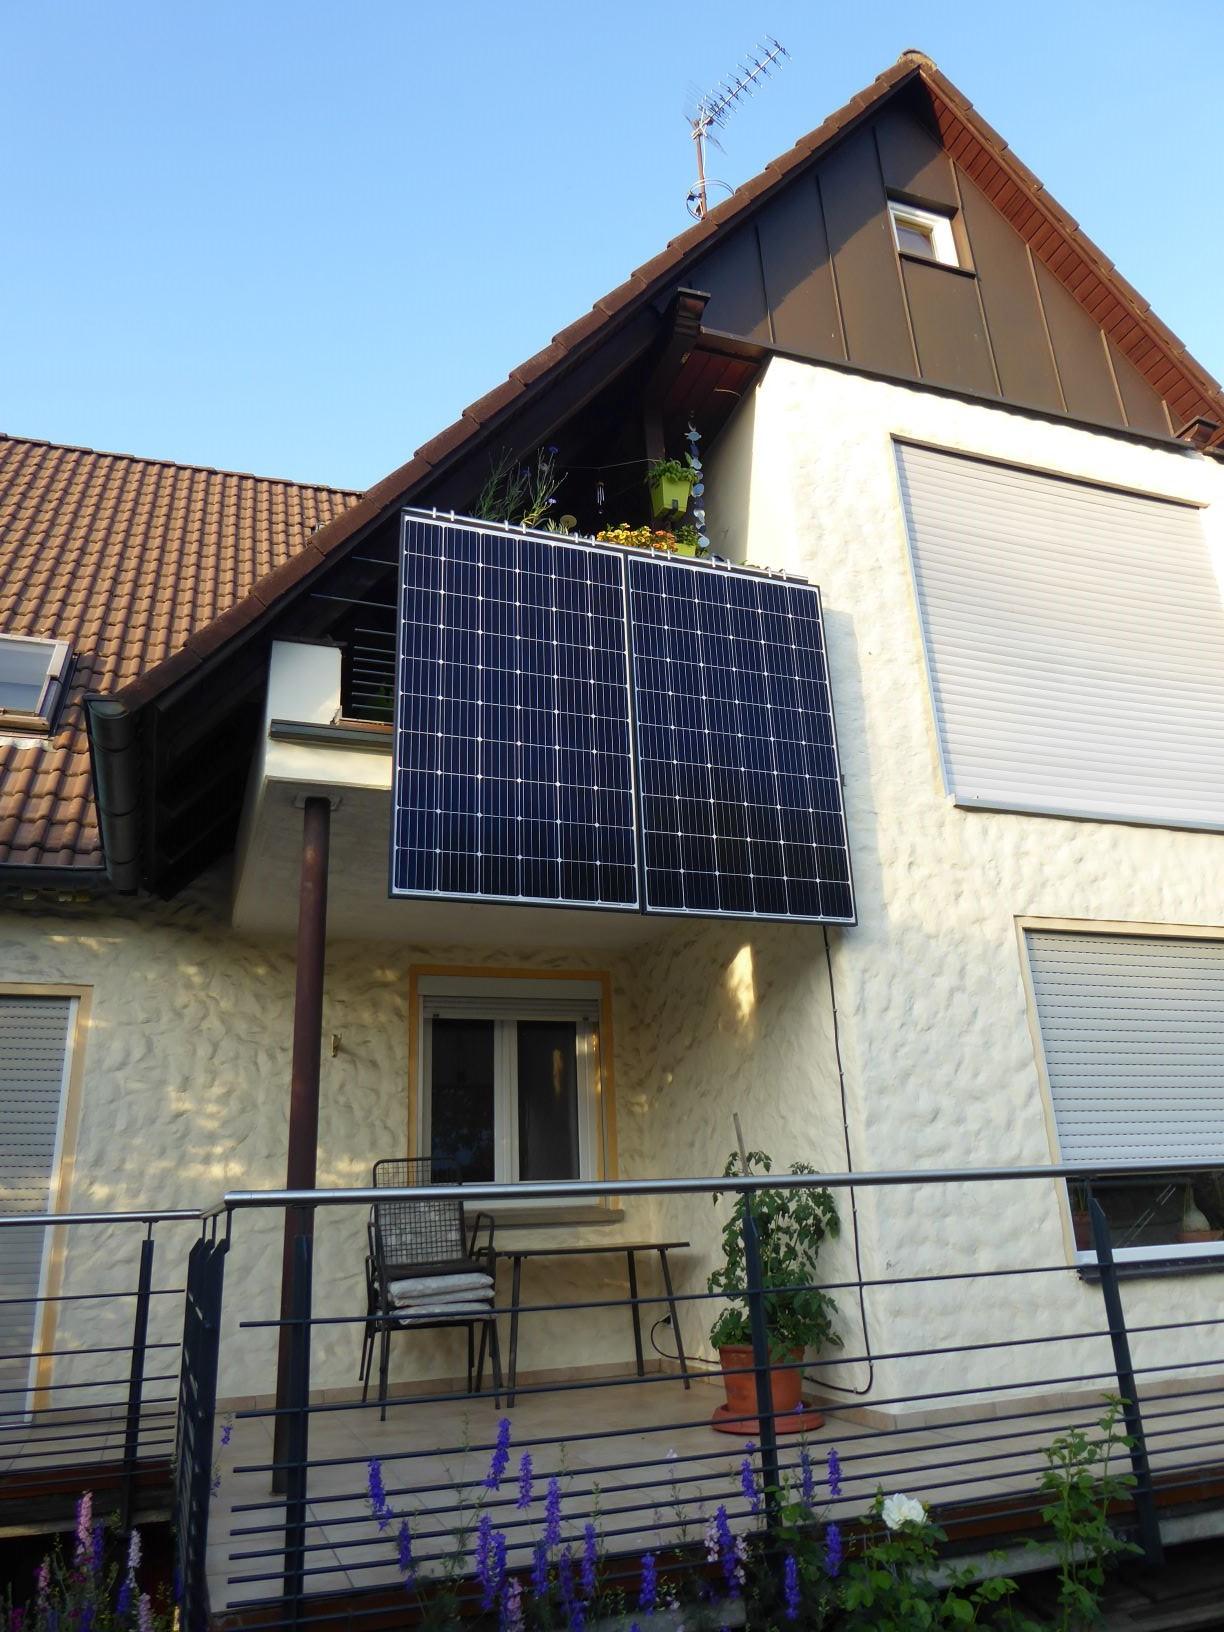 BalkonSolar – Strom sparen